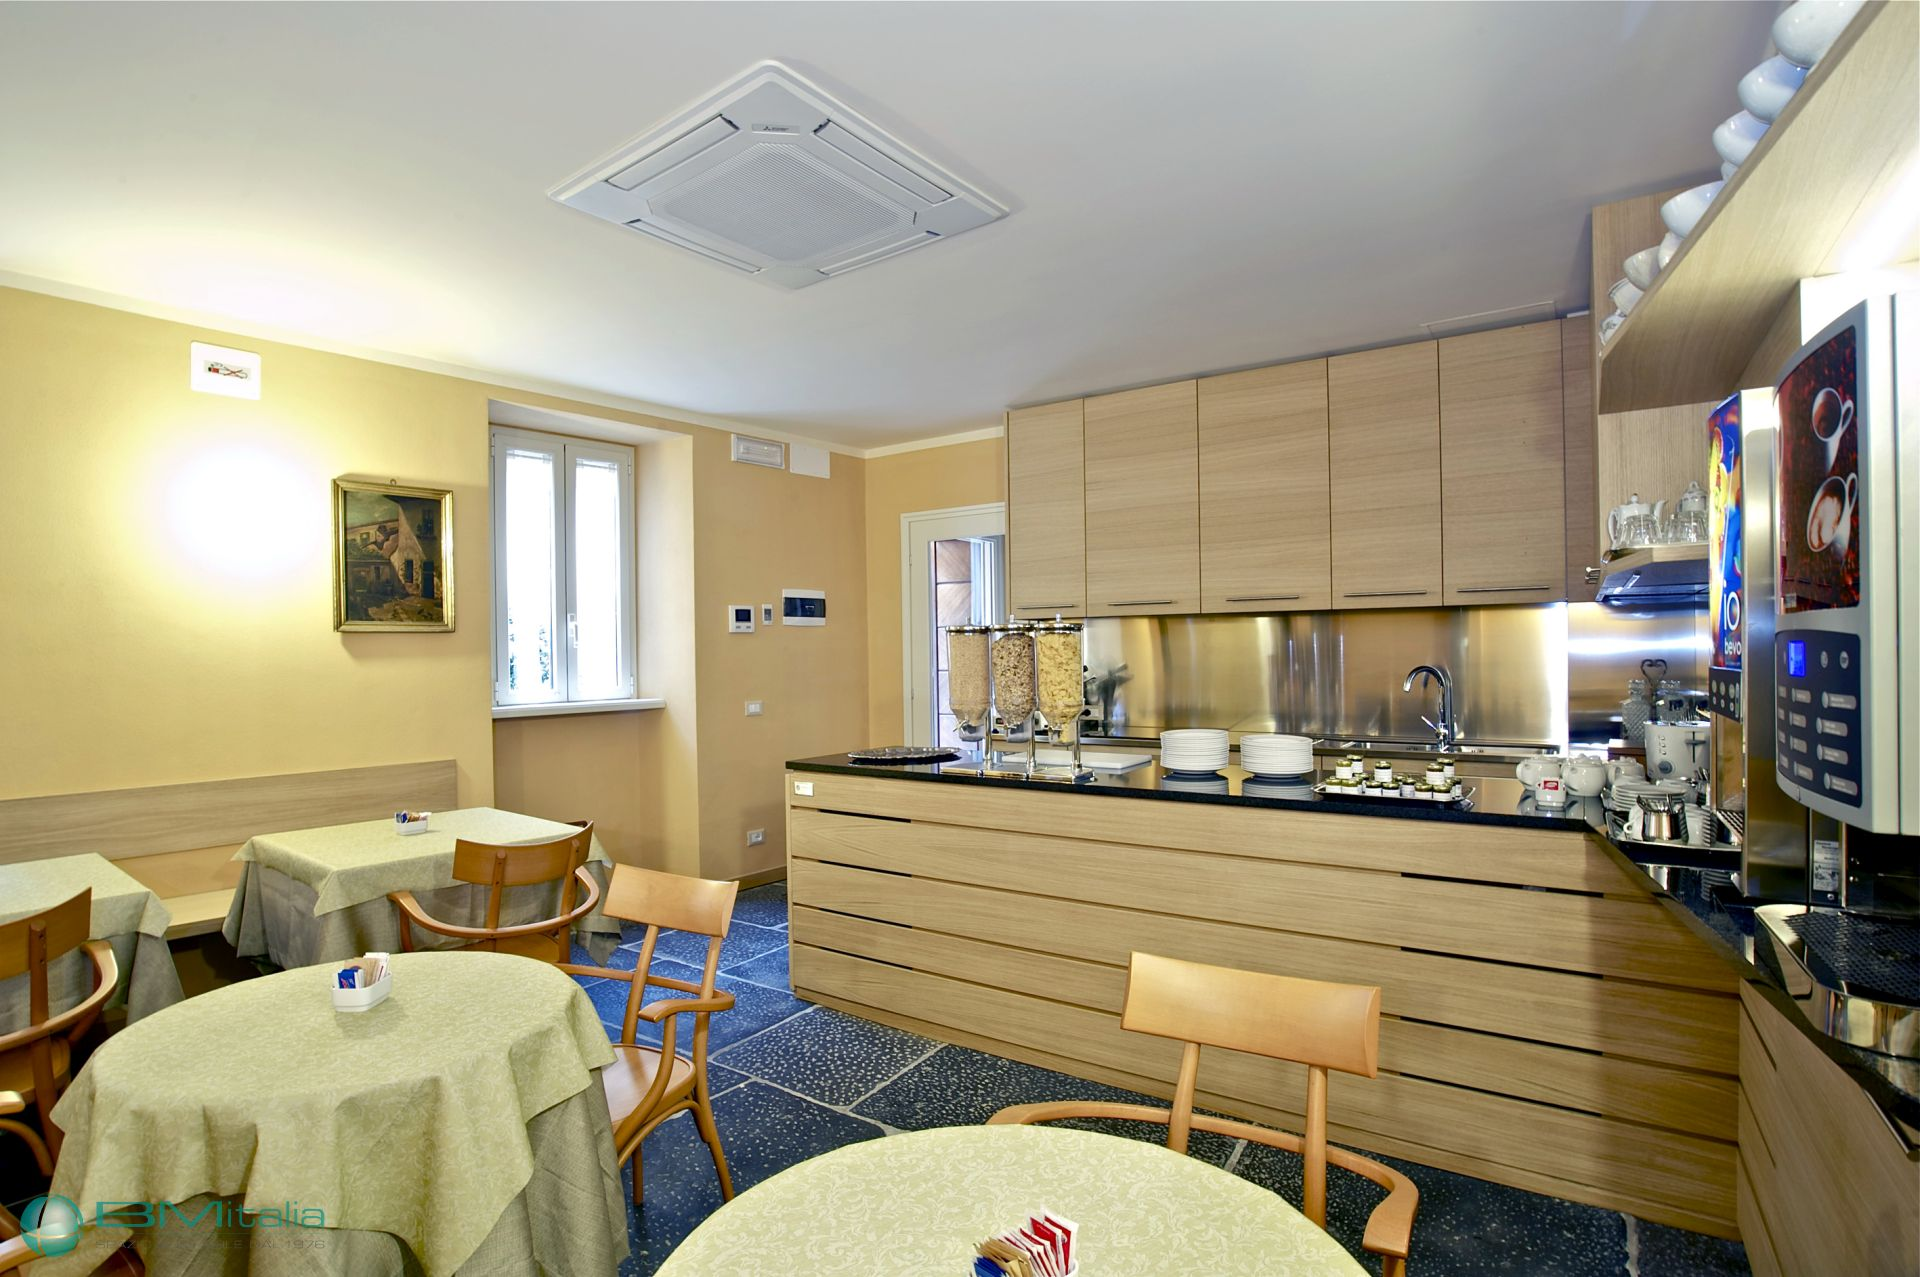 Concreta soluzione esigenze di arredo hotel alberghi bed for Arredi per alberghi e hotel